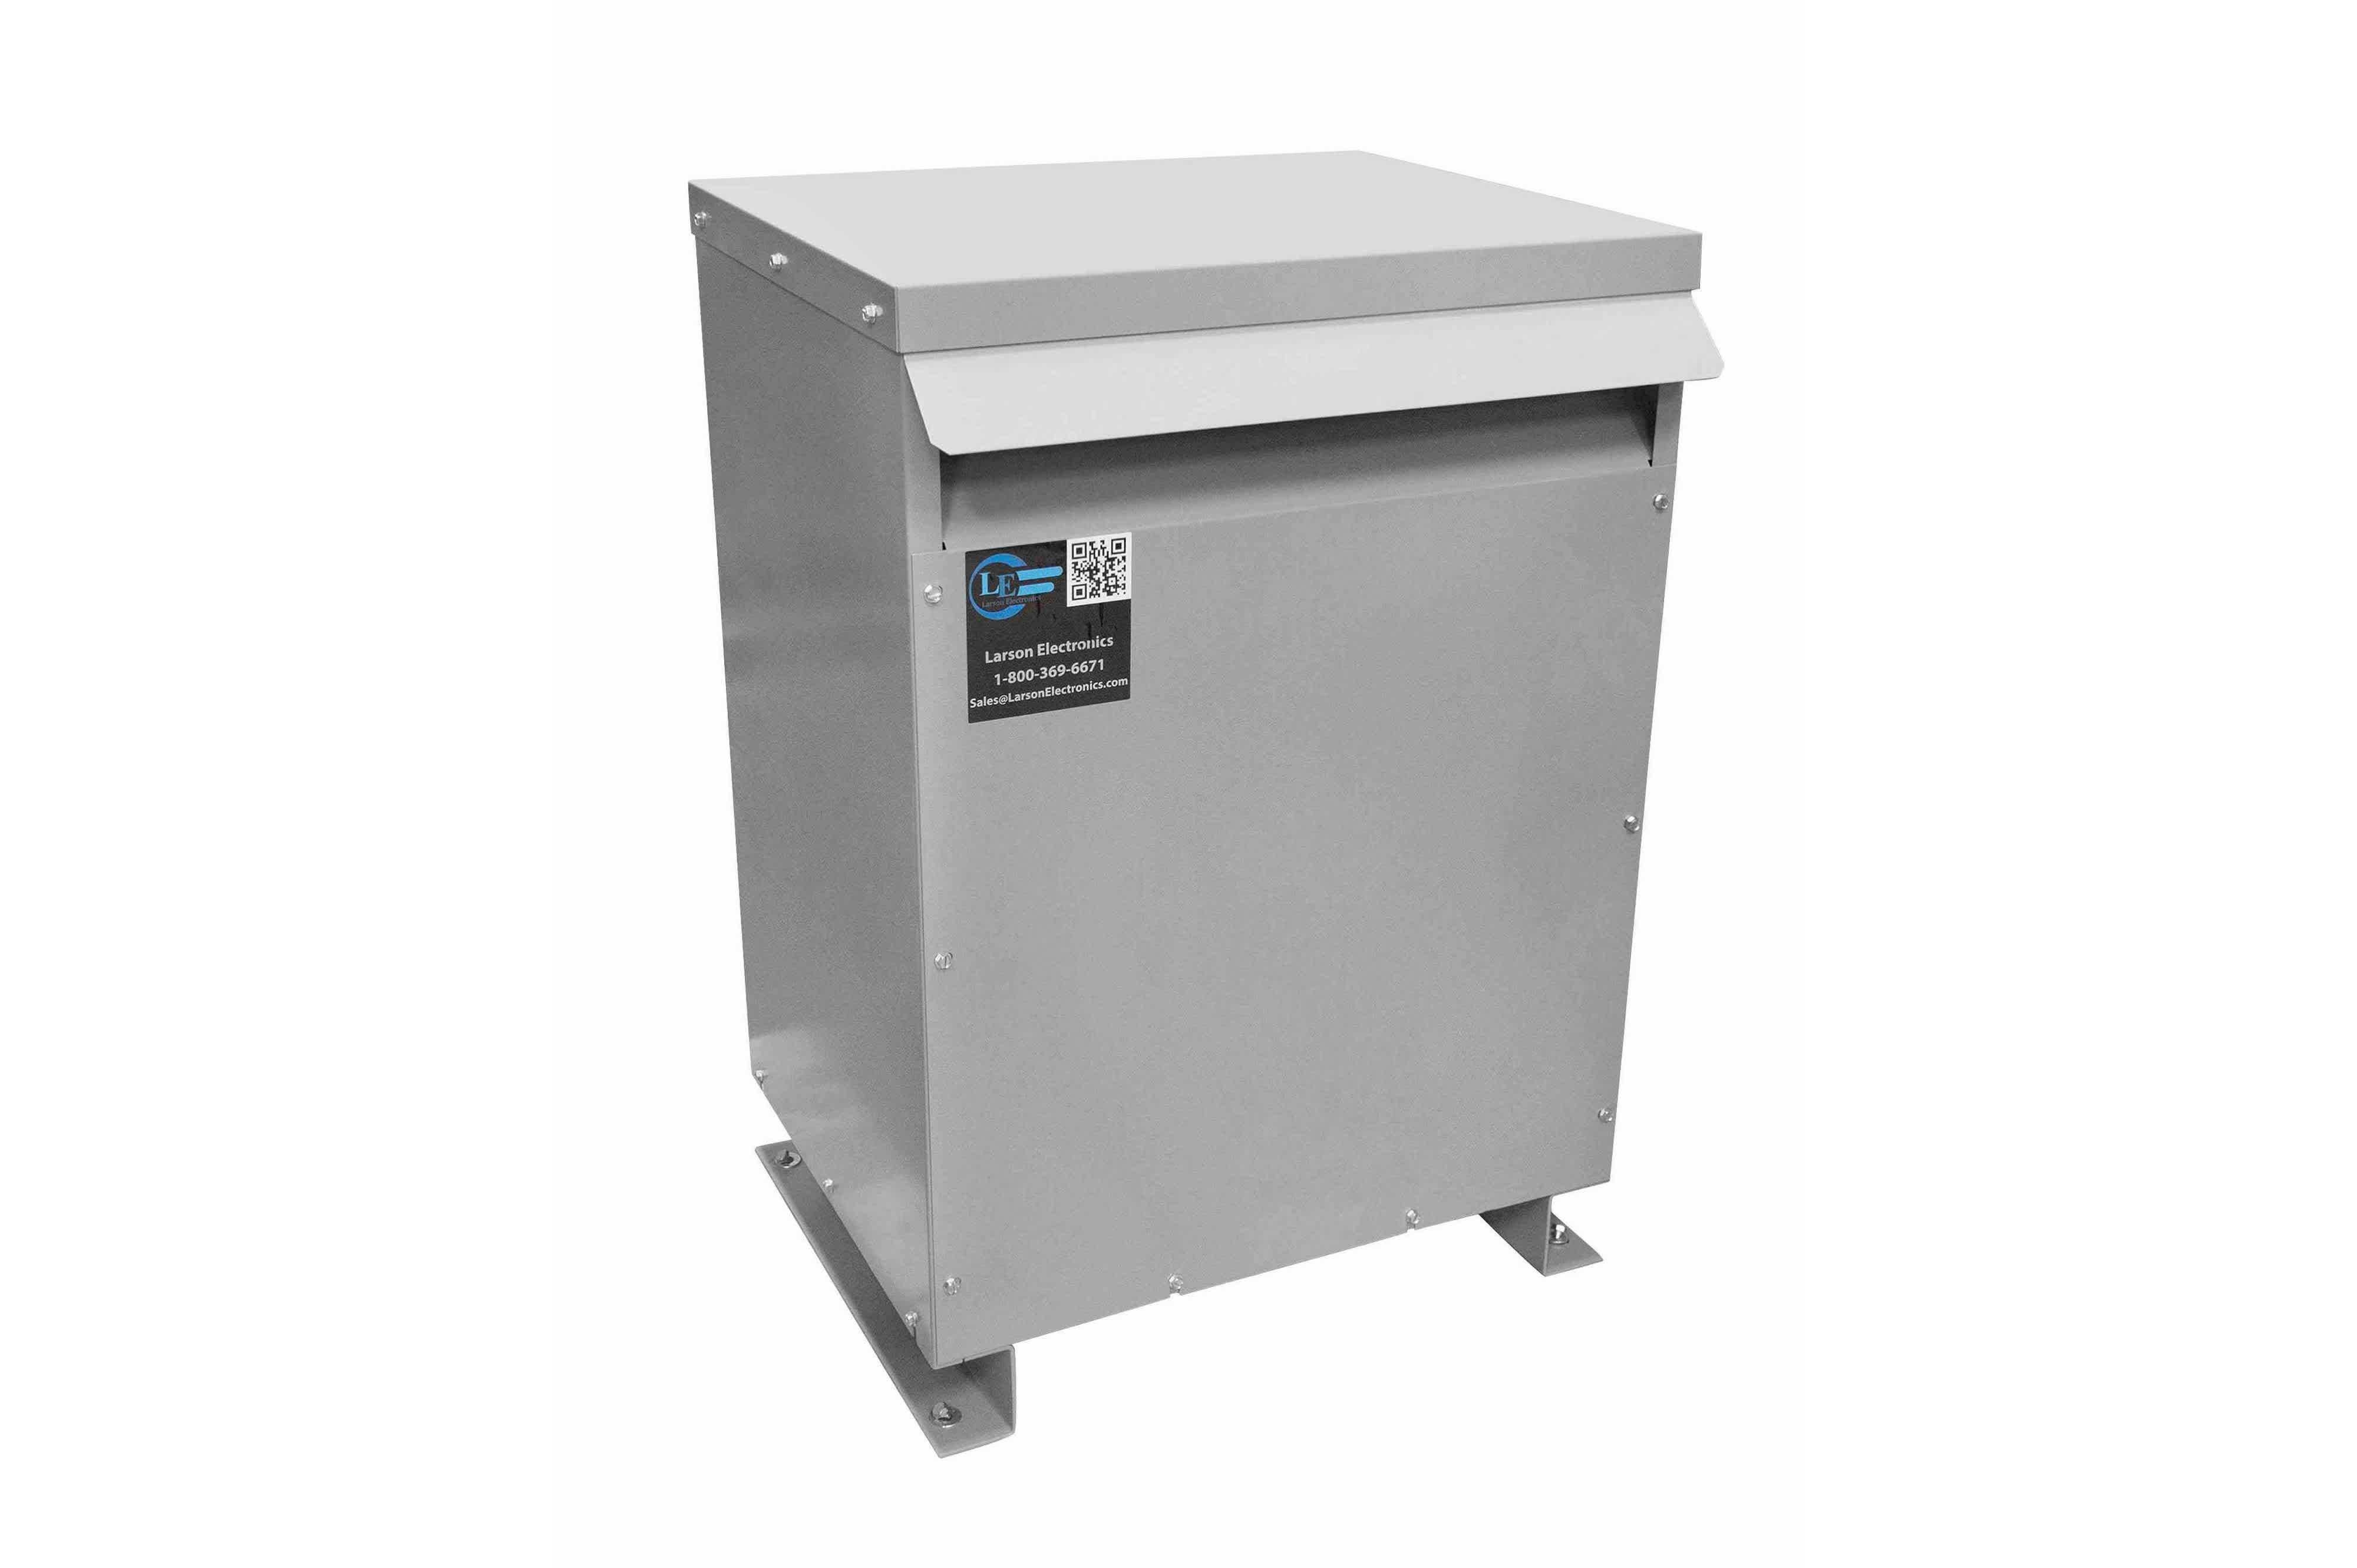 900 kVA 3PH Isolation Transformer, 460V Wye Primary, 600Y/347 Wye-N Secondary, N3R, Ventilated, 60 Hz